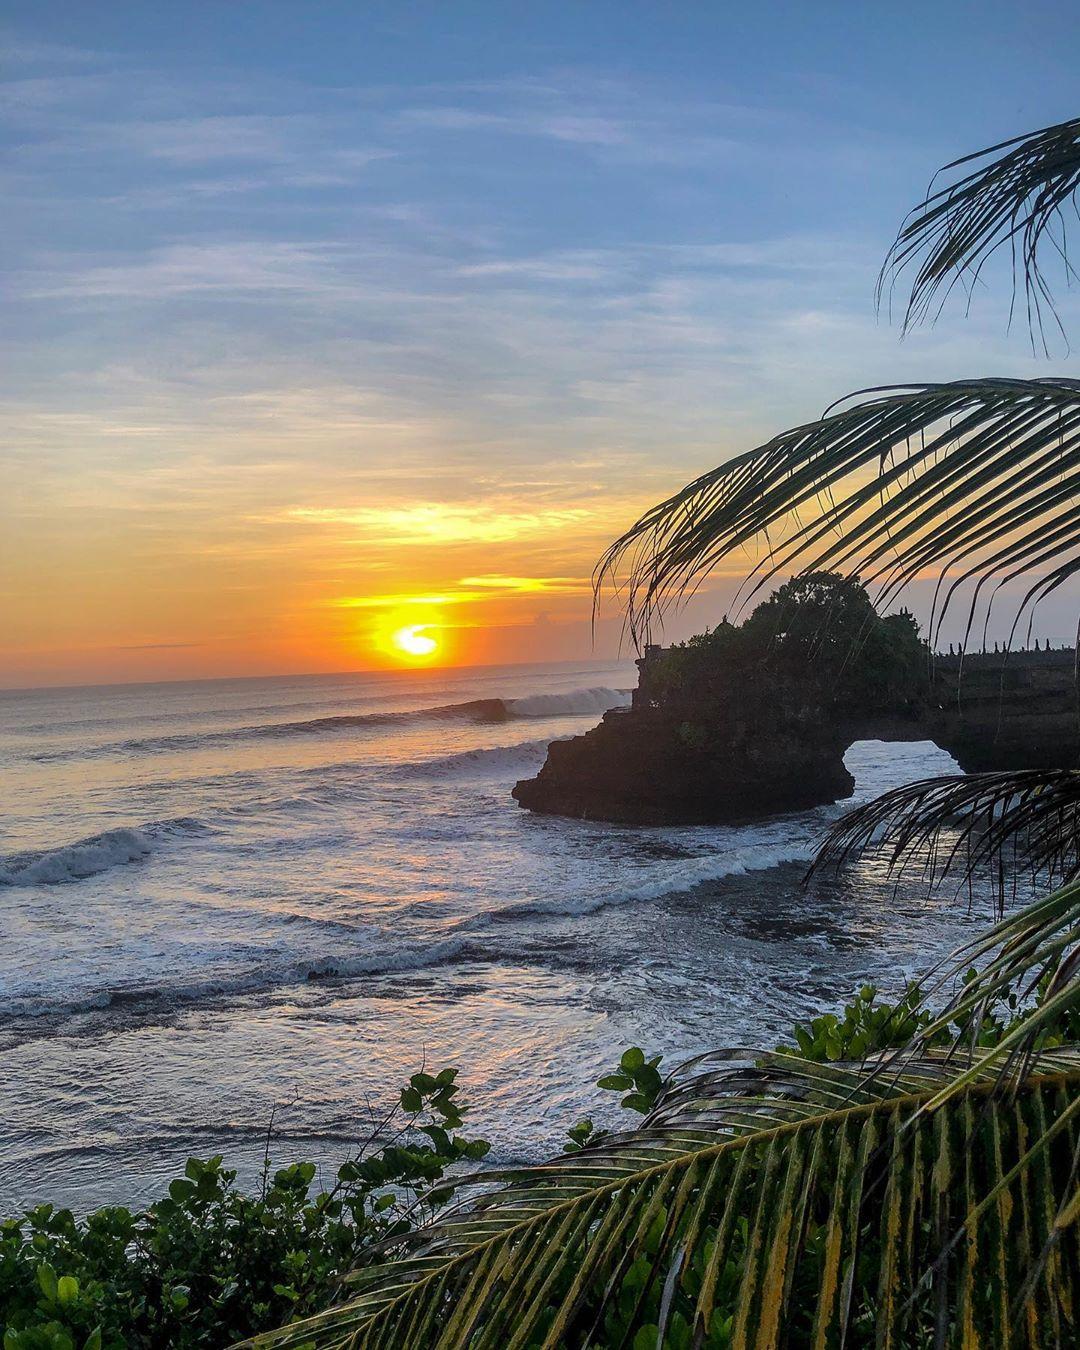 Beaches in Bali; Tanah Lot